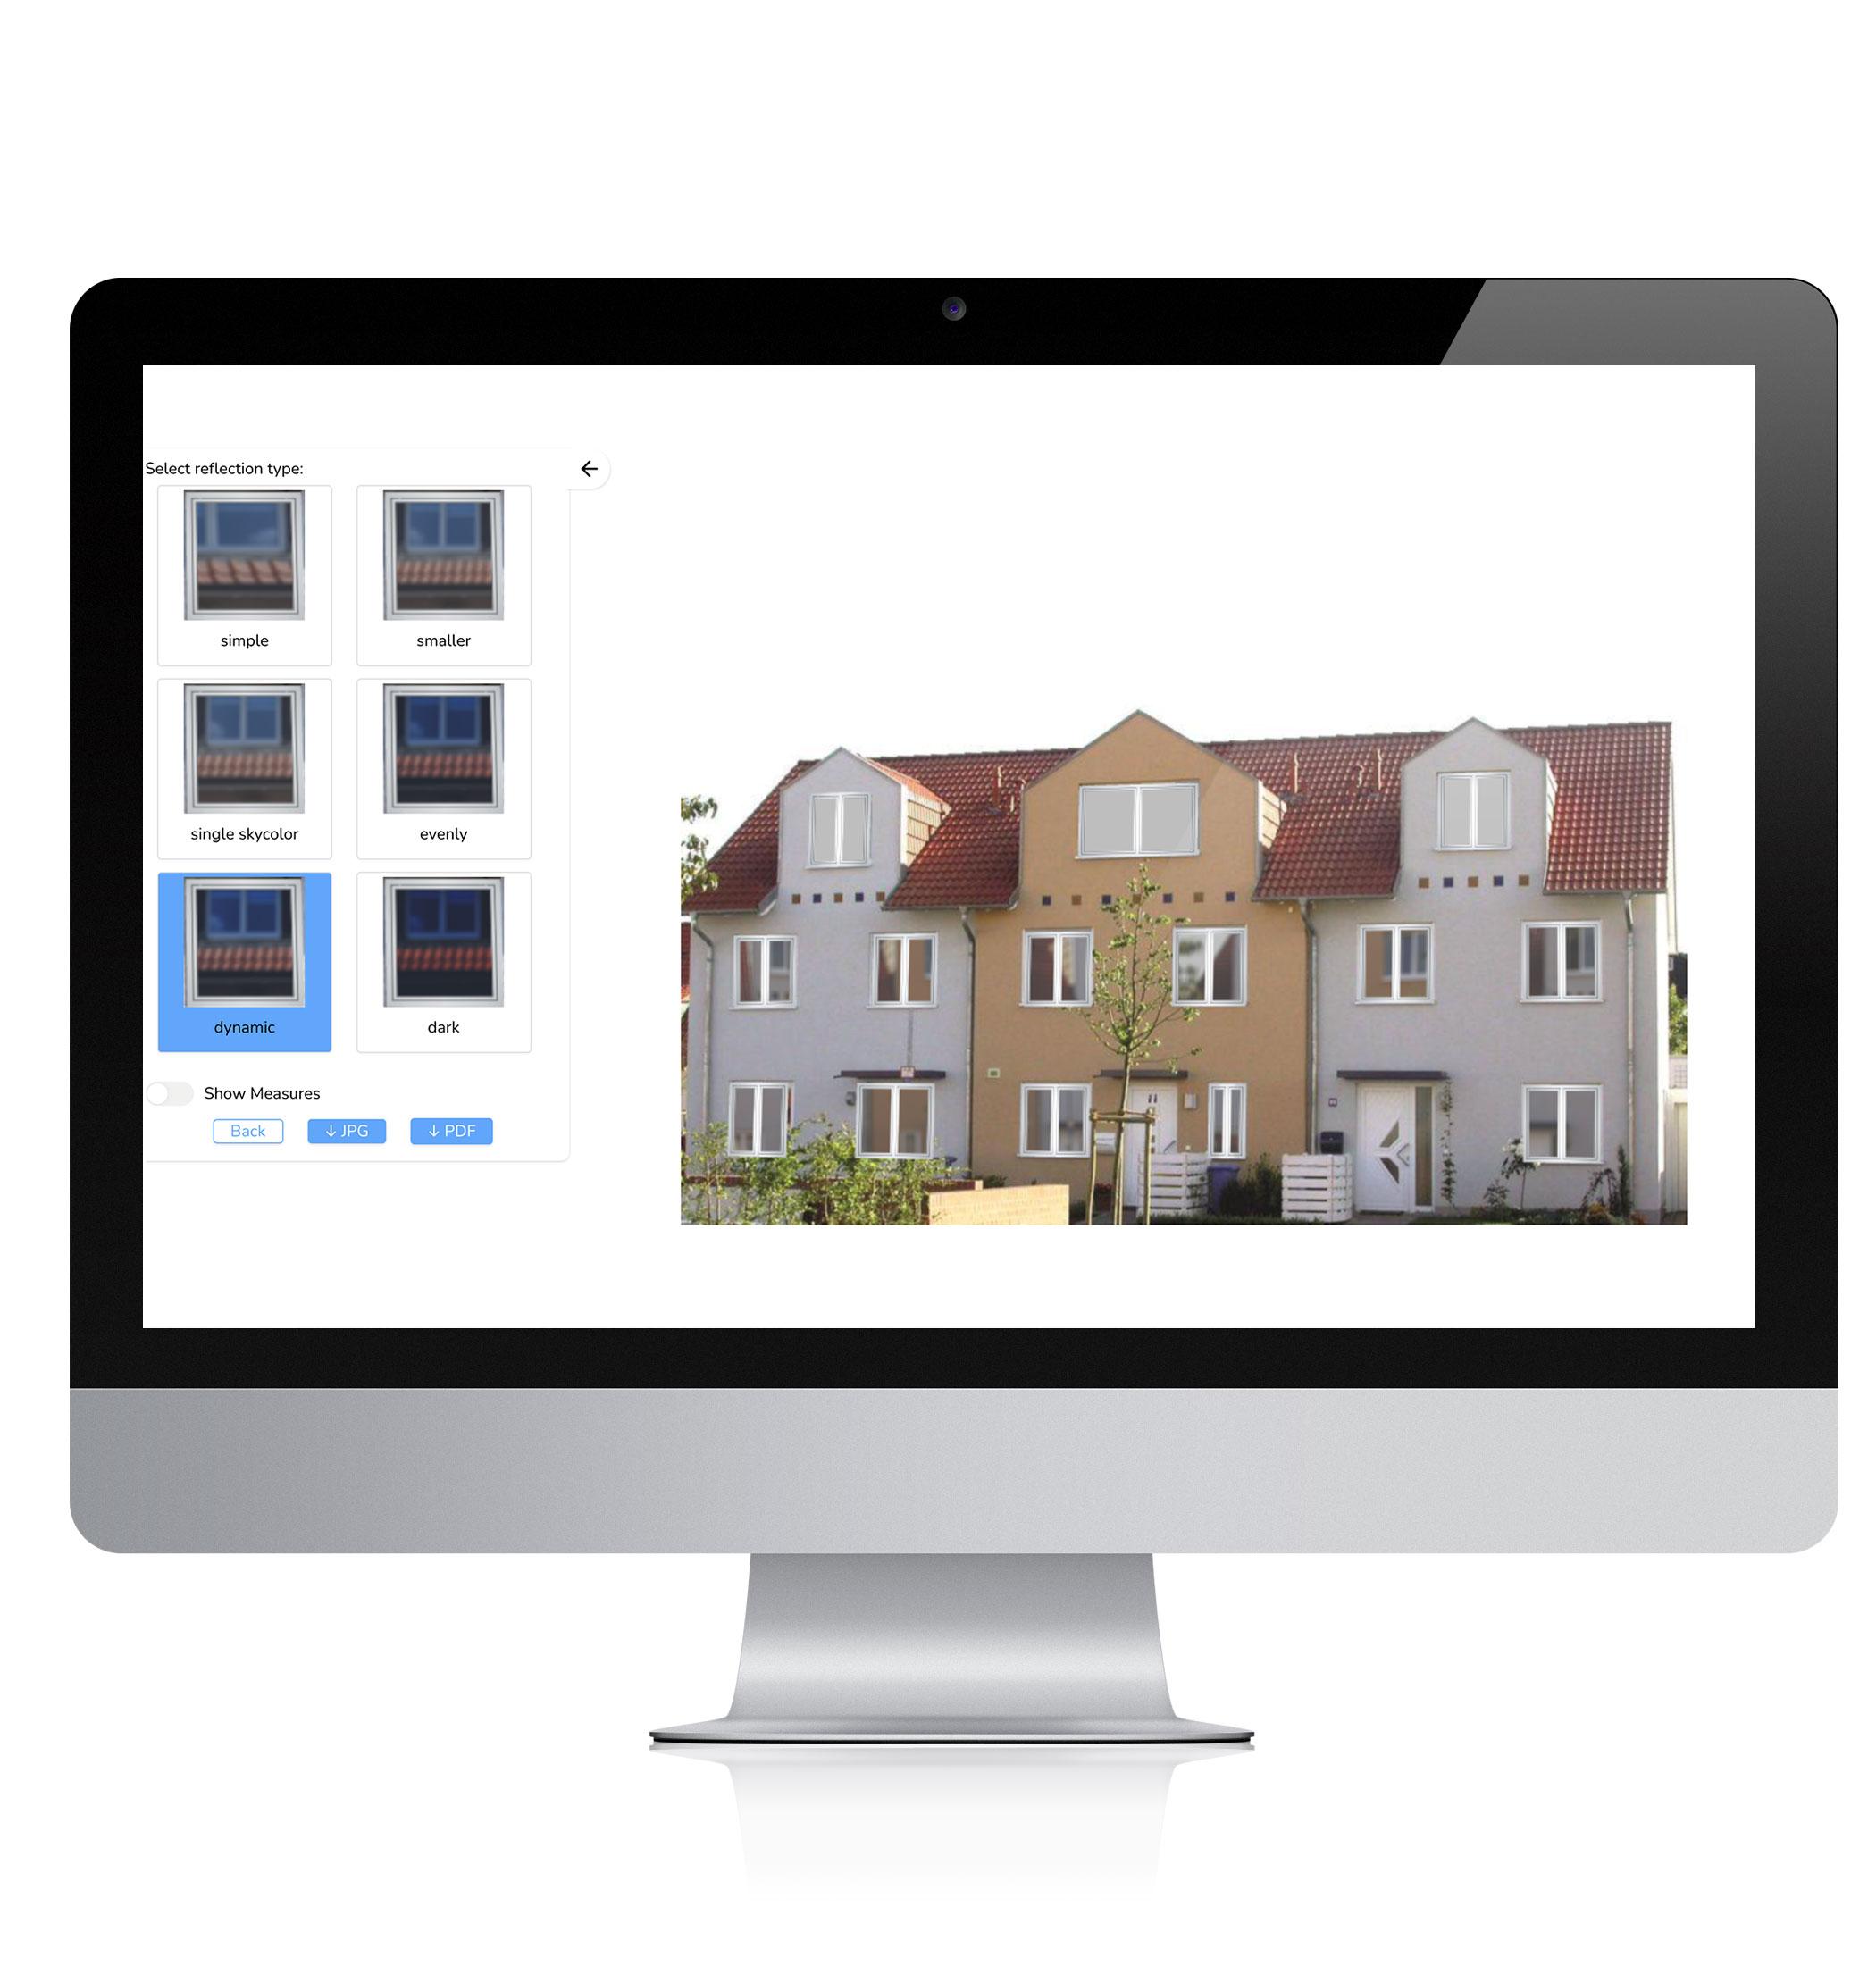 FacadeViewer as a web application on the desktop